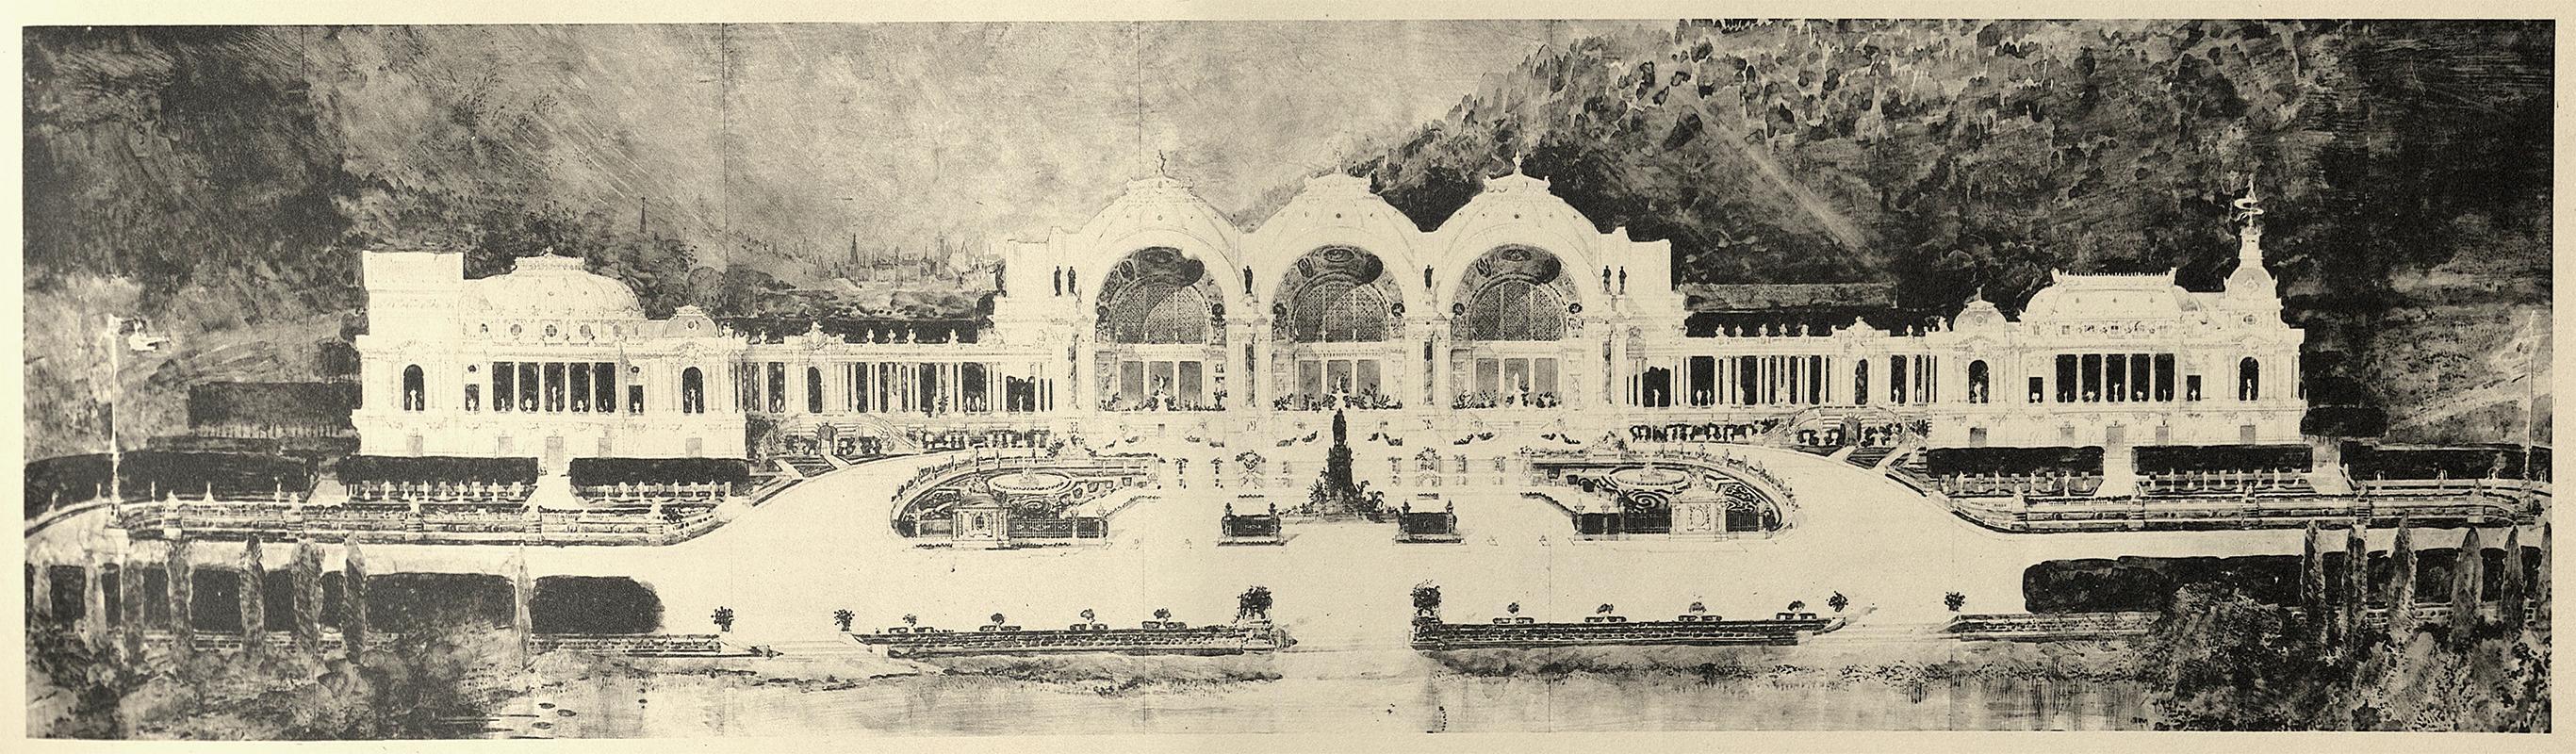 Charles Lemaresquier. Les Grands Prix de Rome V.4 1900, 478